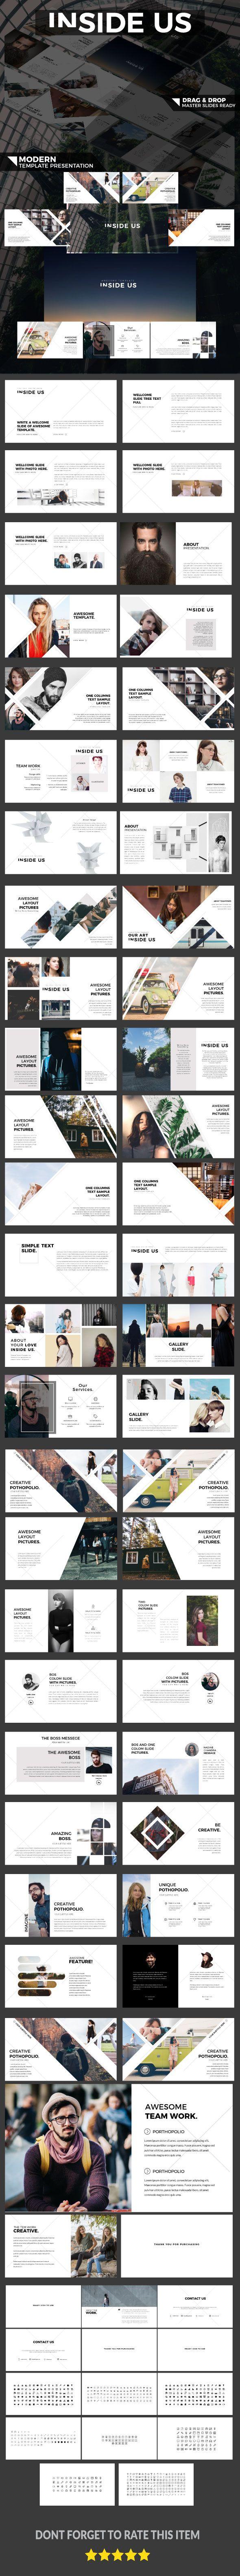 INSIDE US - Modern Presentation - Business PowerPoint Templates